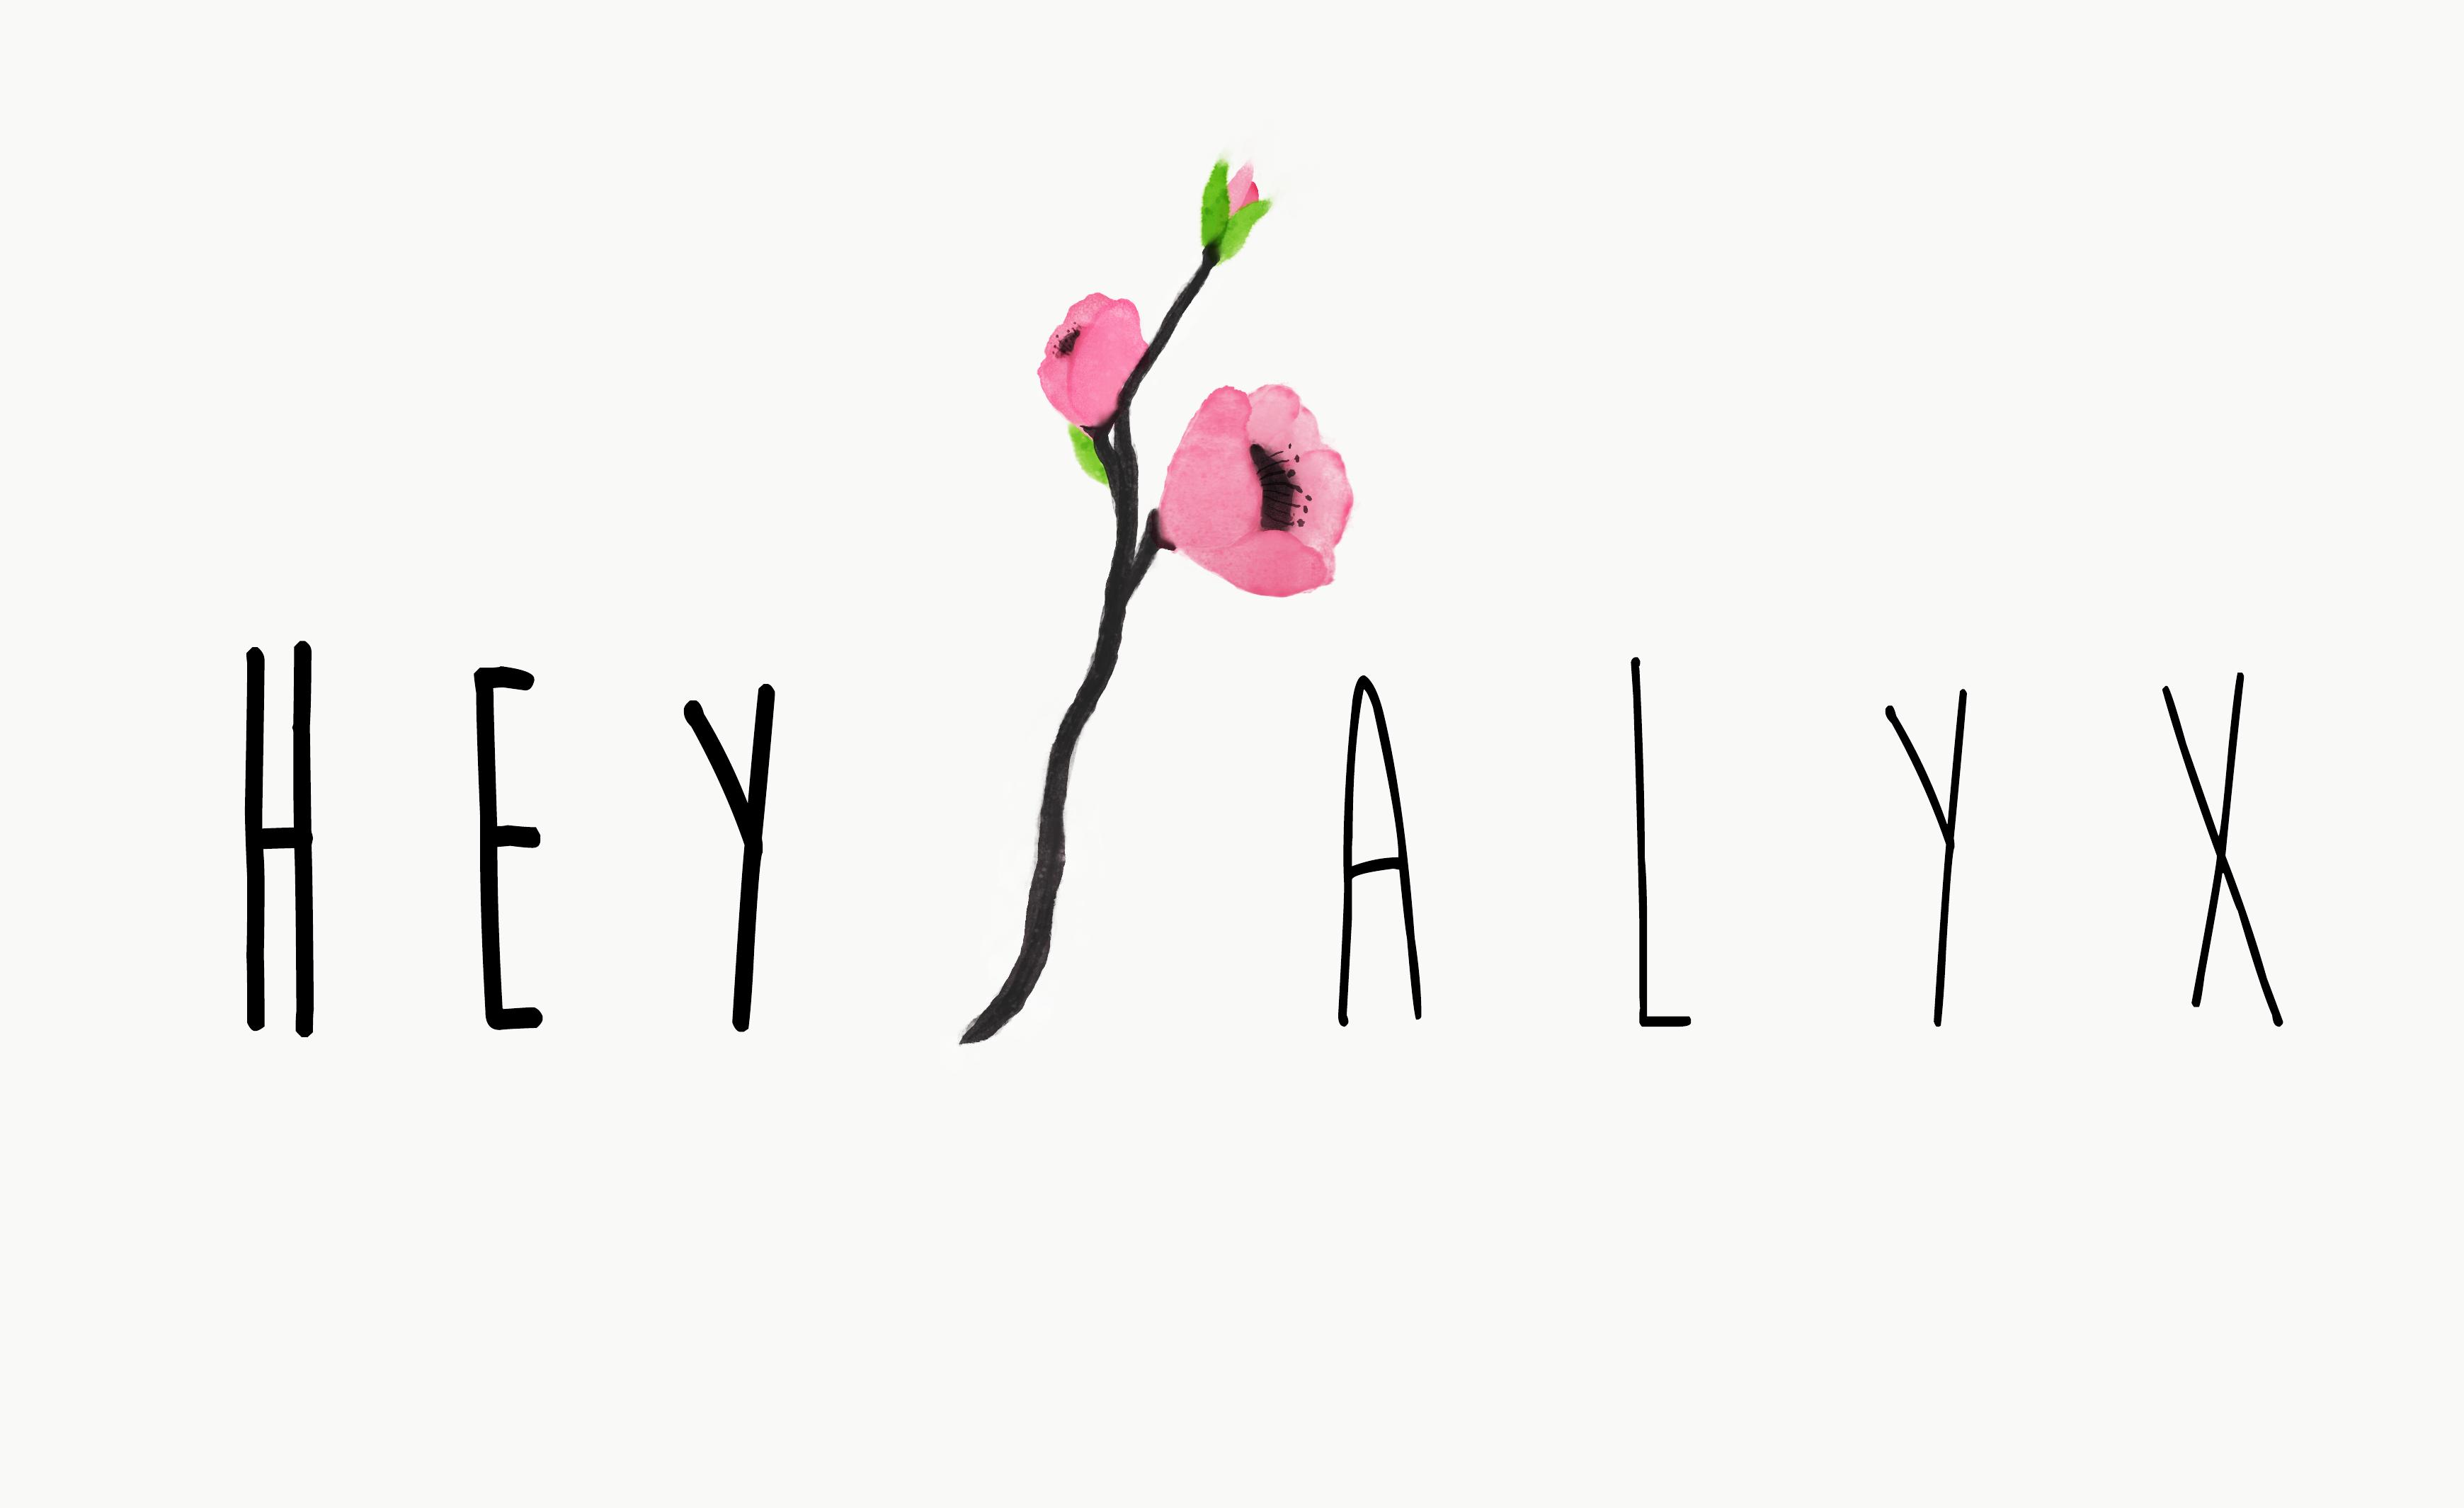 alyx carolus